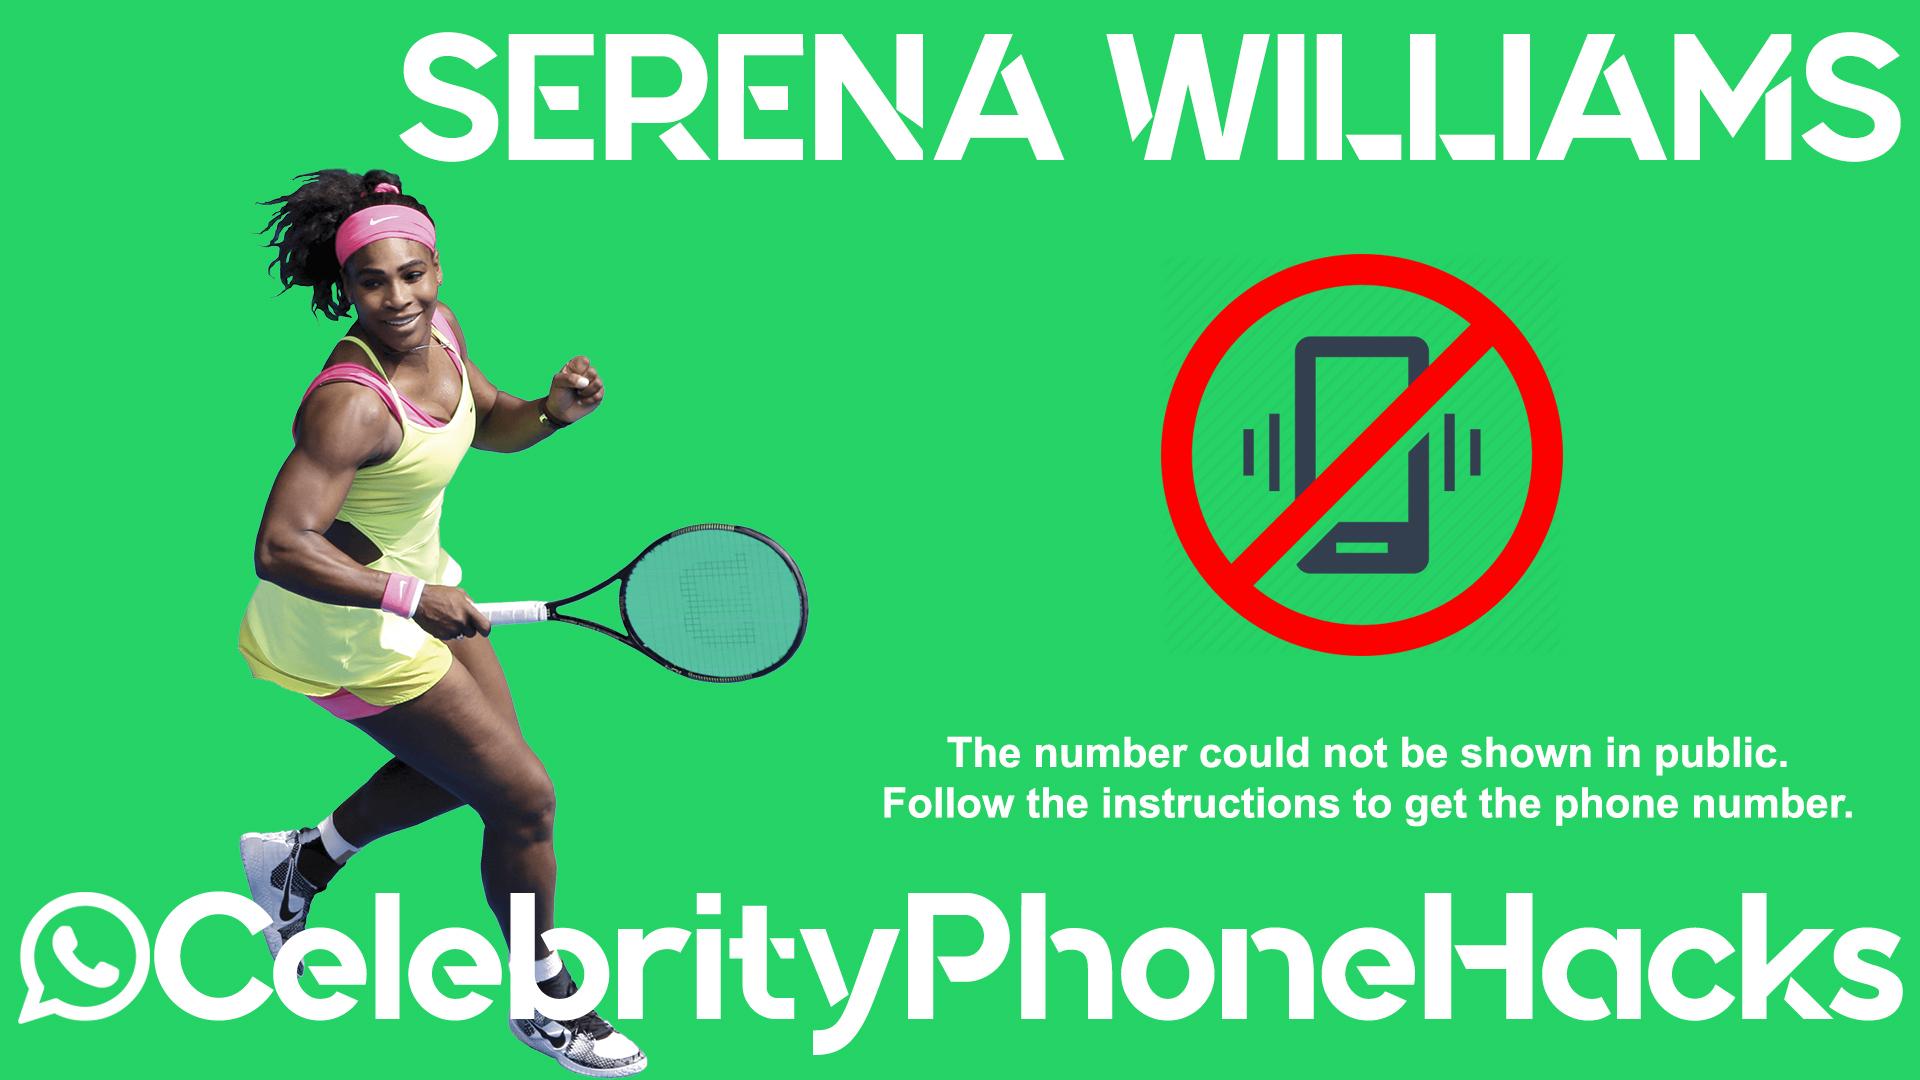 Serena Williams real phone number 2019 whatsapp hacked leaked